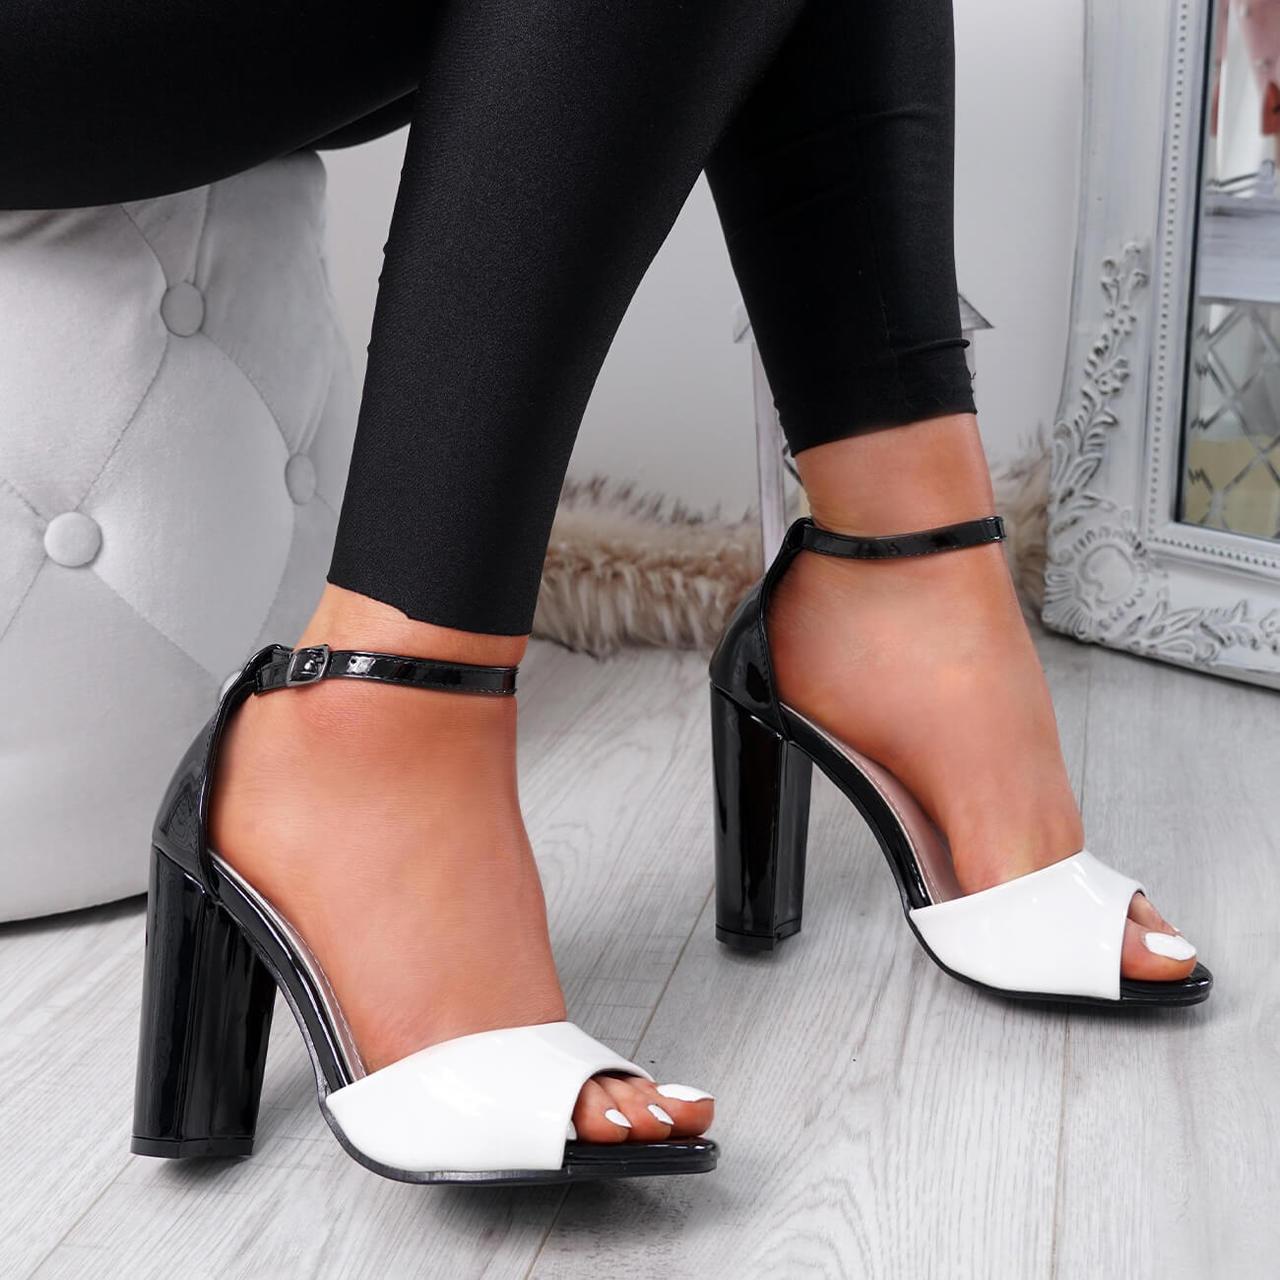 571c1cf3ea Womens Ladies Ankle Strap High Block Heel Sandals Peep Toe Office Casual  Shoes